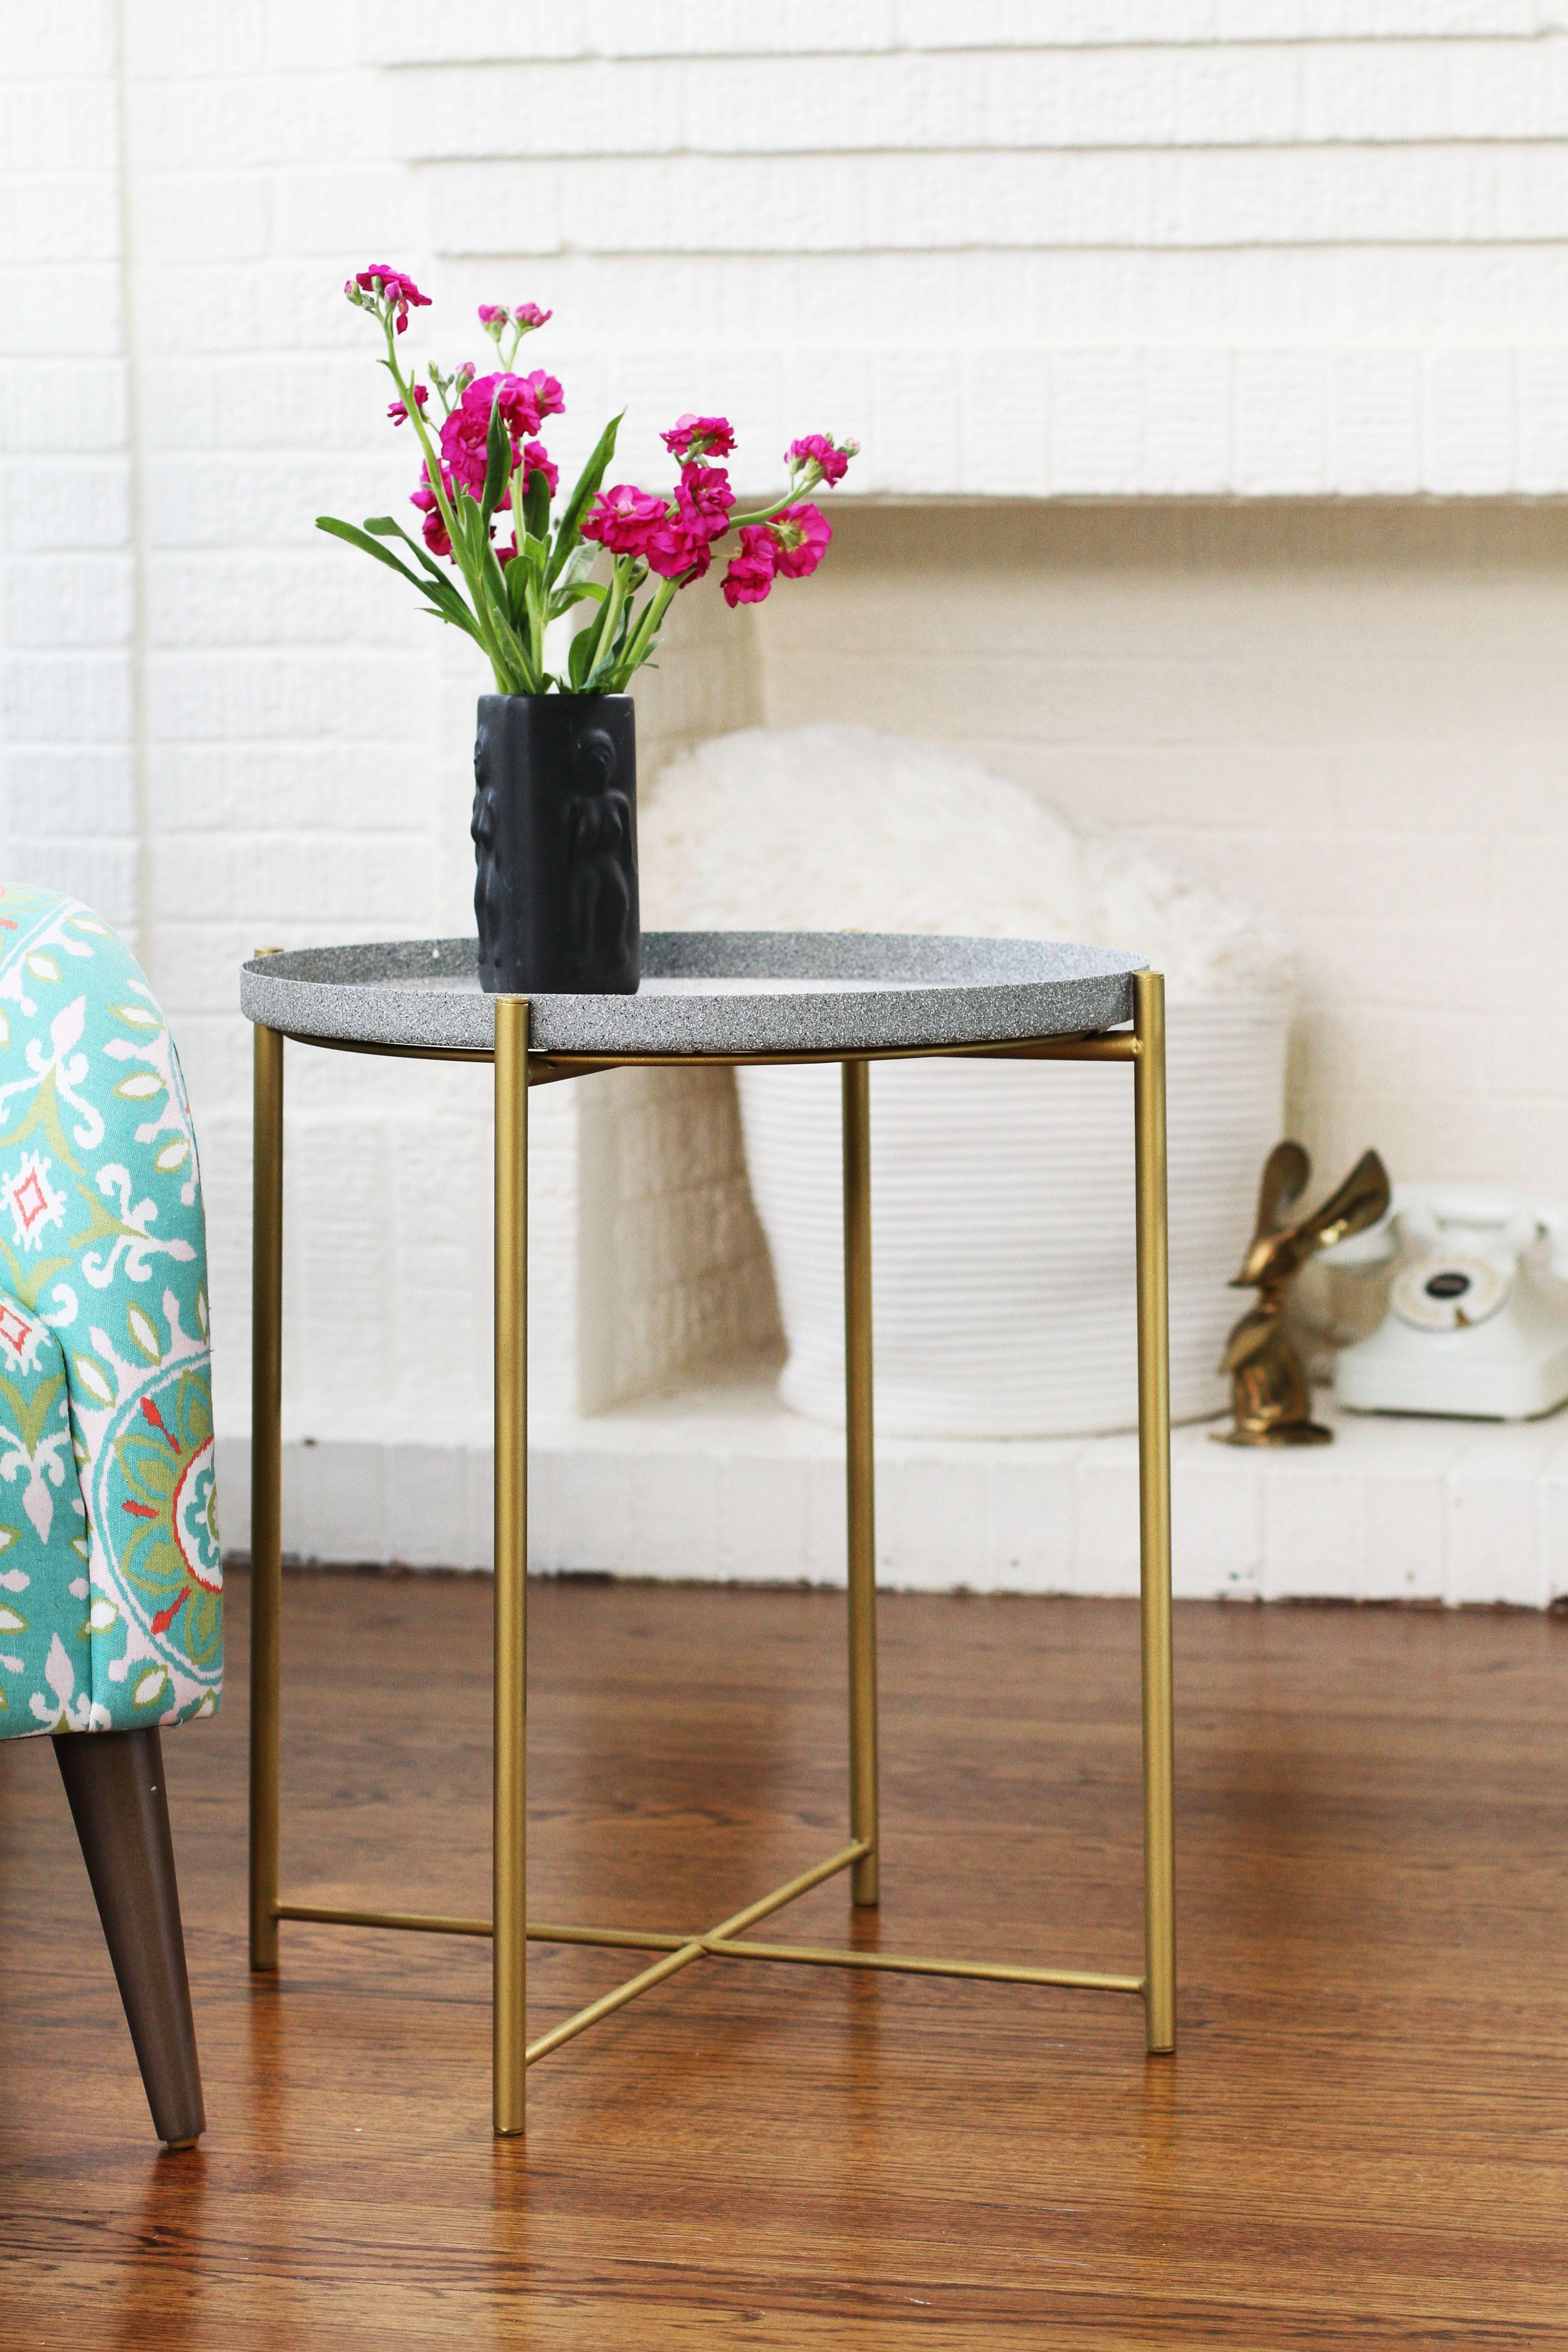 A 30 Ikea Table Gets A Glamorous Spray Paint Hack Ikea Side Table Ikea Table Furniture Hacks [ 4953 x 3302 Pixel ]